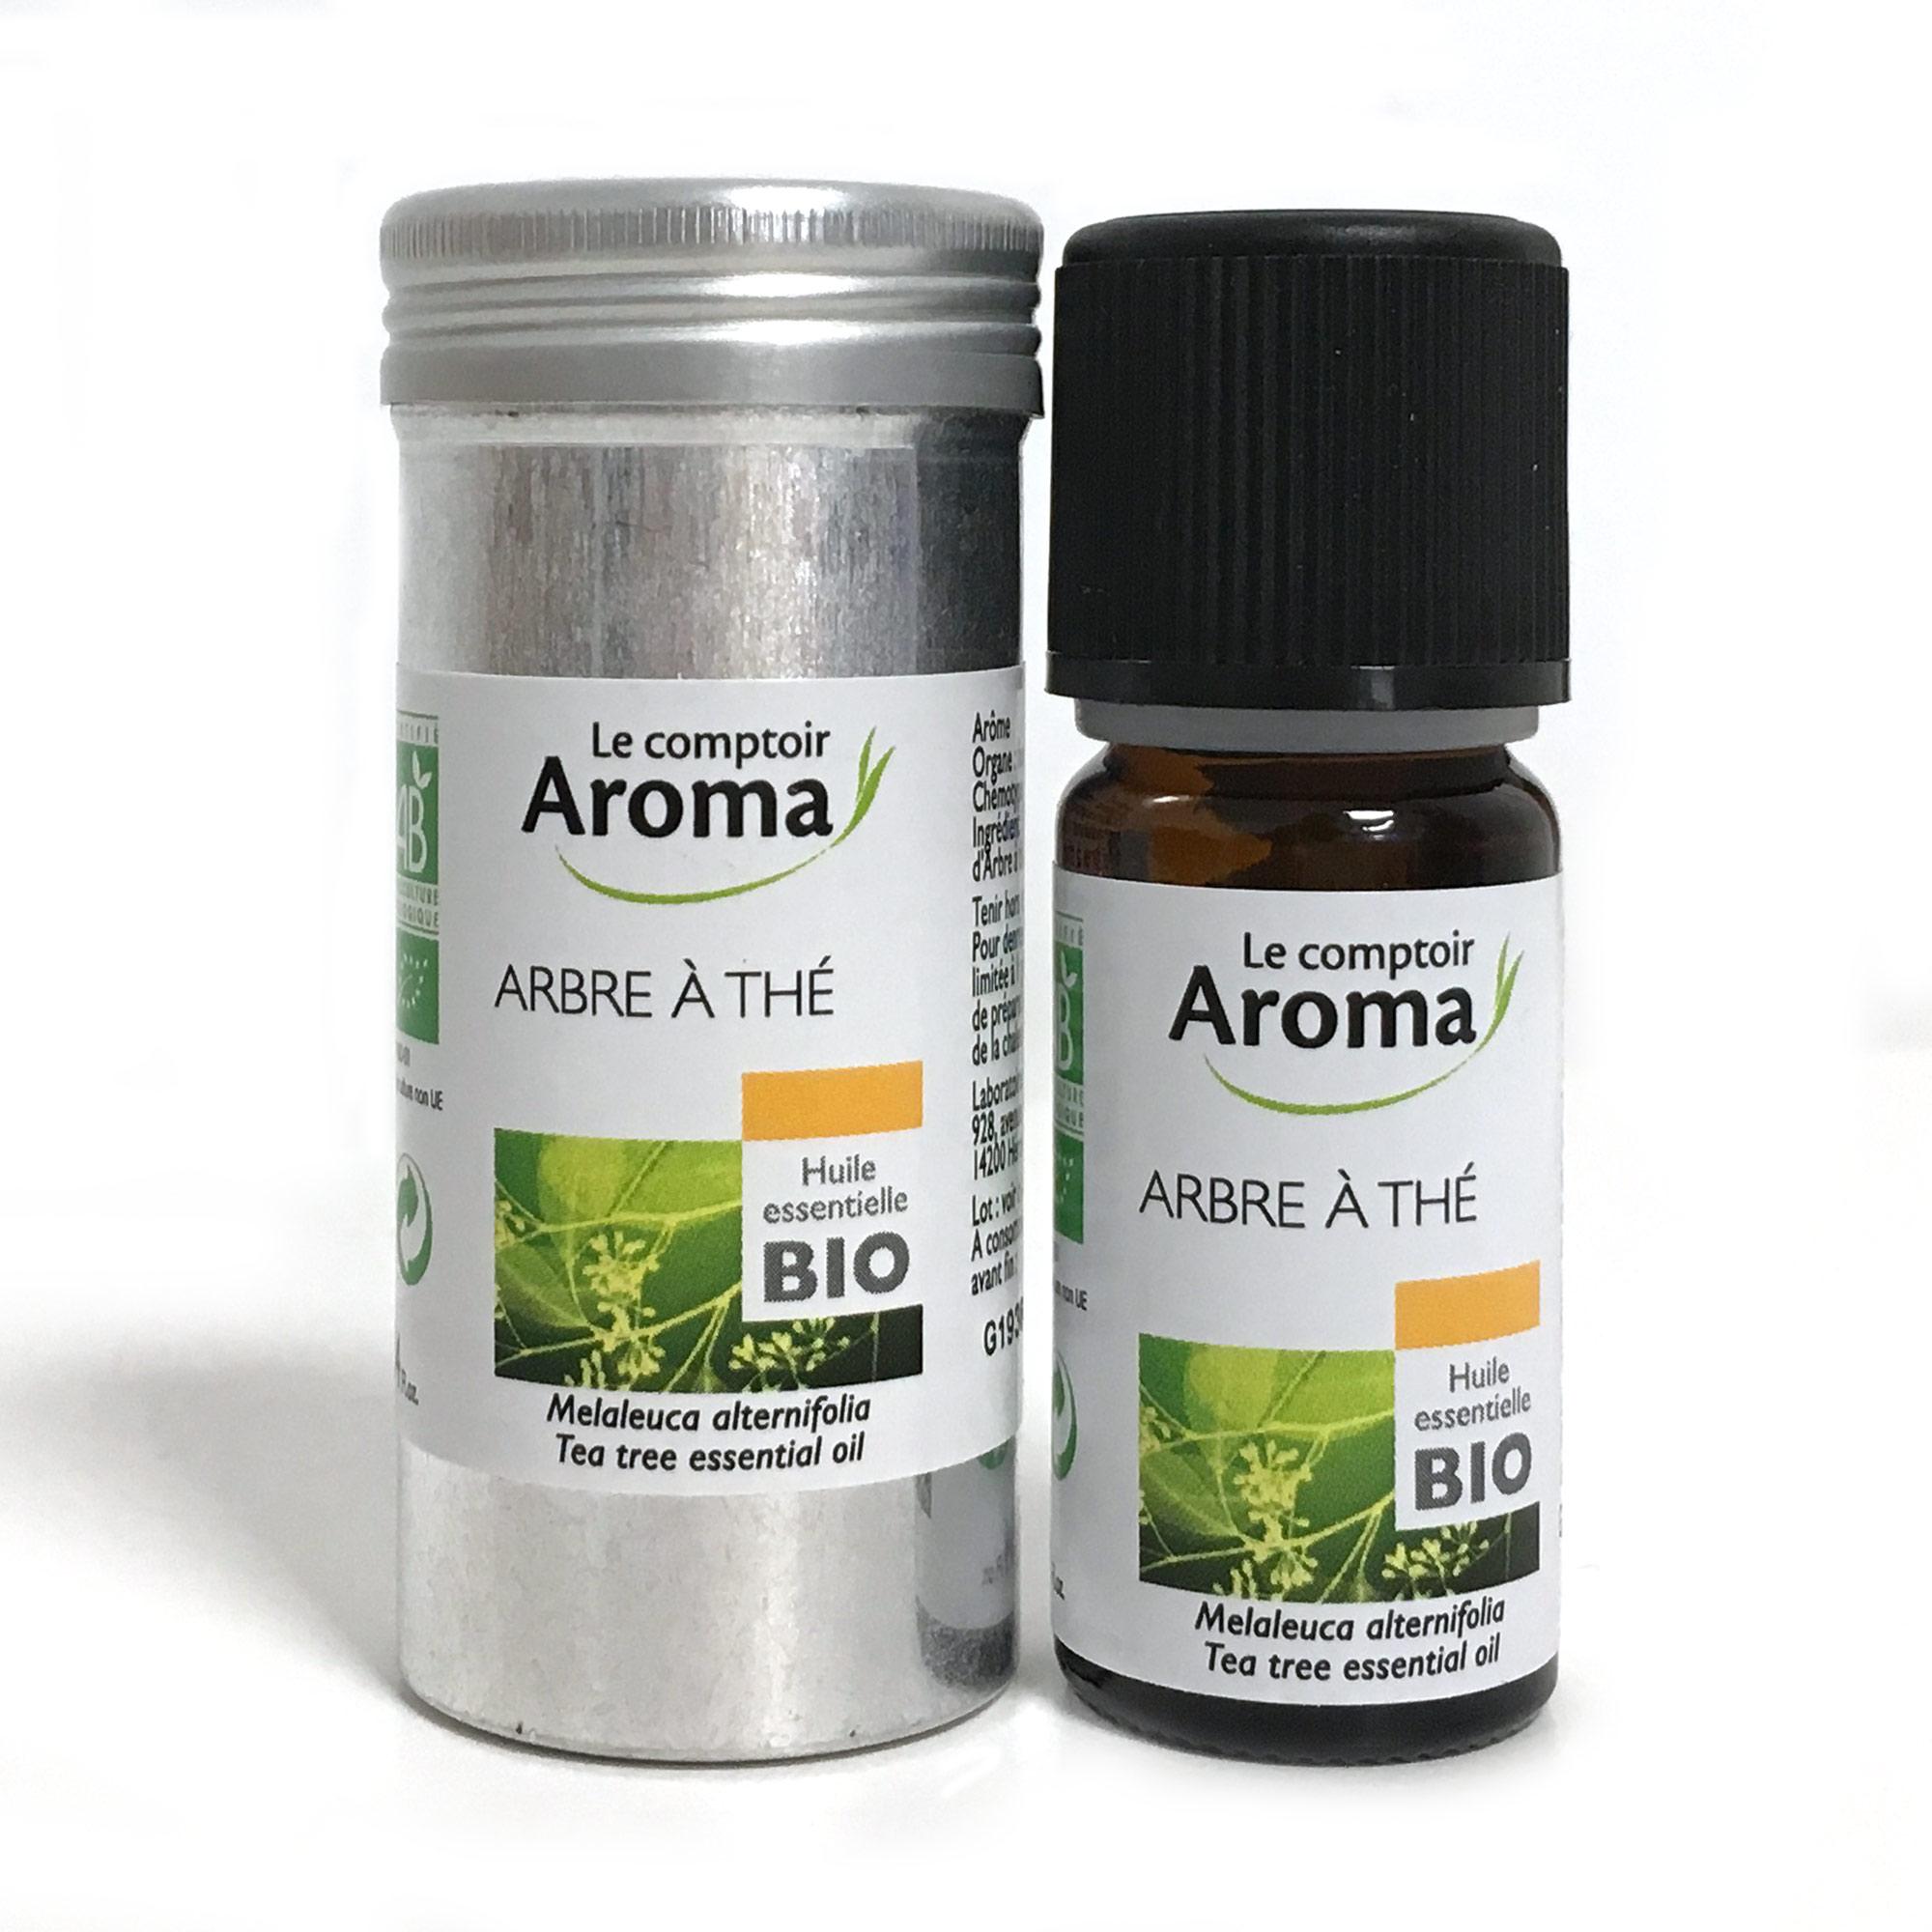 Le comptoiraroma huile essentielle d 39 arbre th bio flacon 10ml pharmacie en ligne prado mermoz - Huile essentielle d arbre a the ...